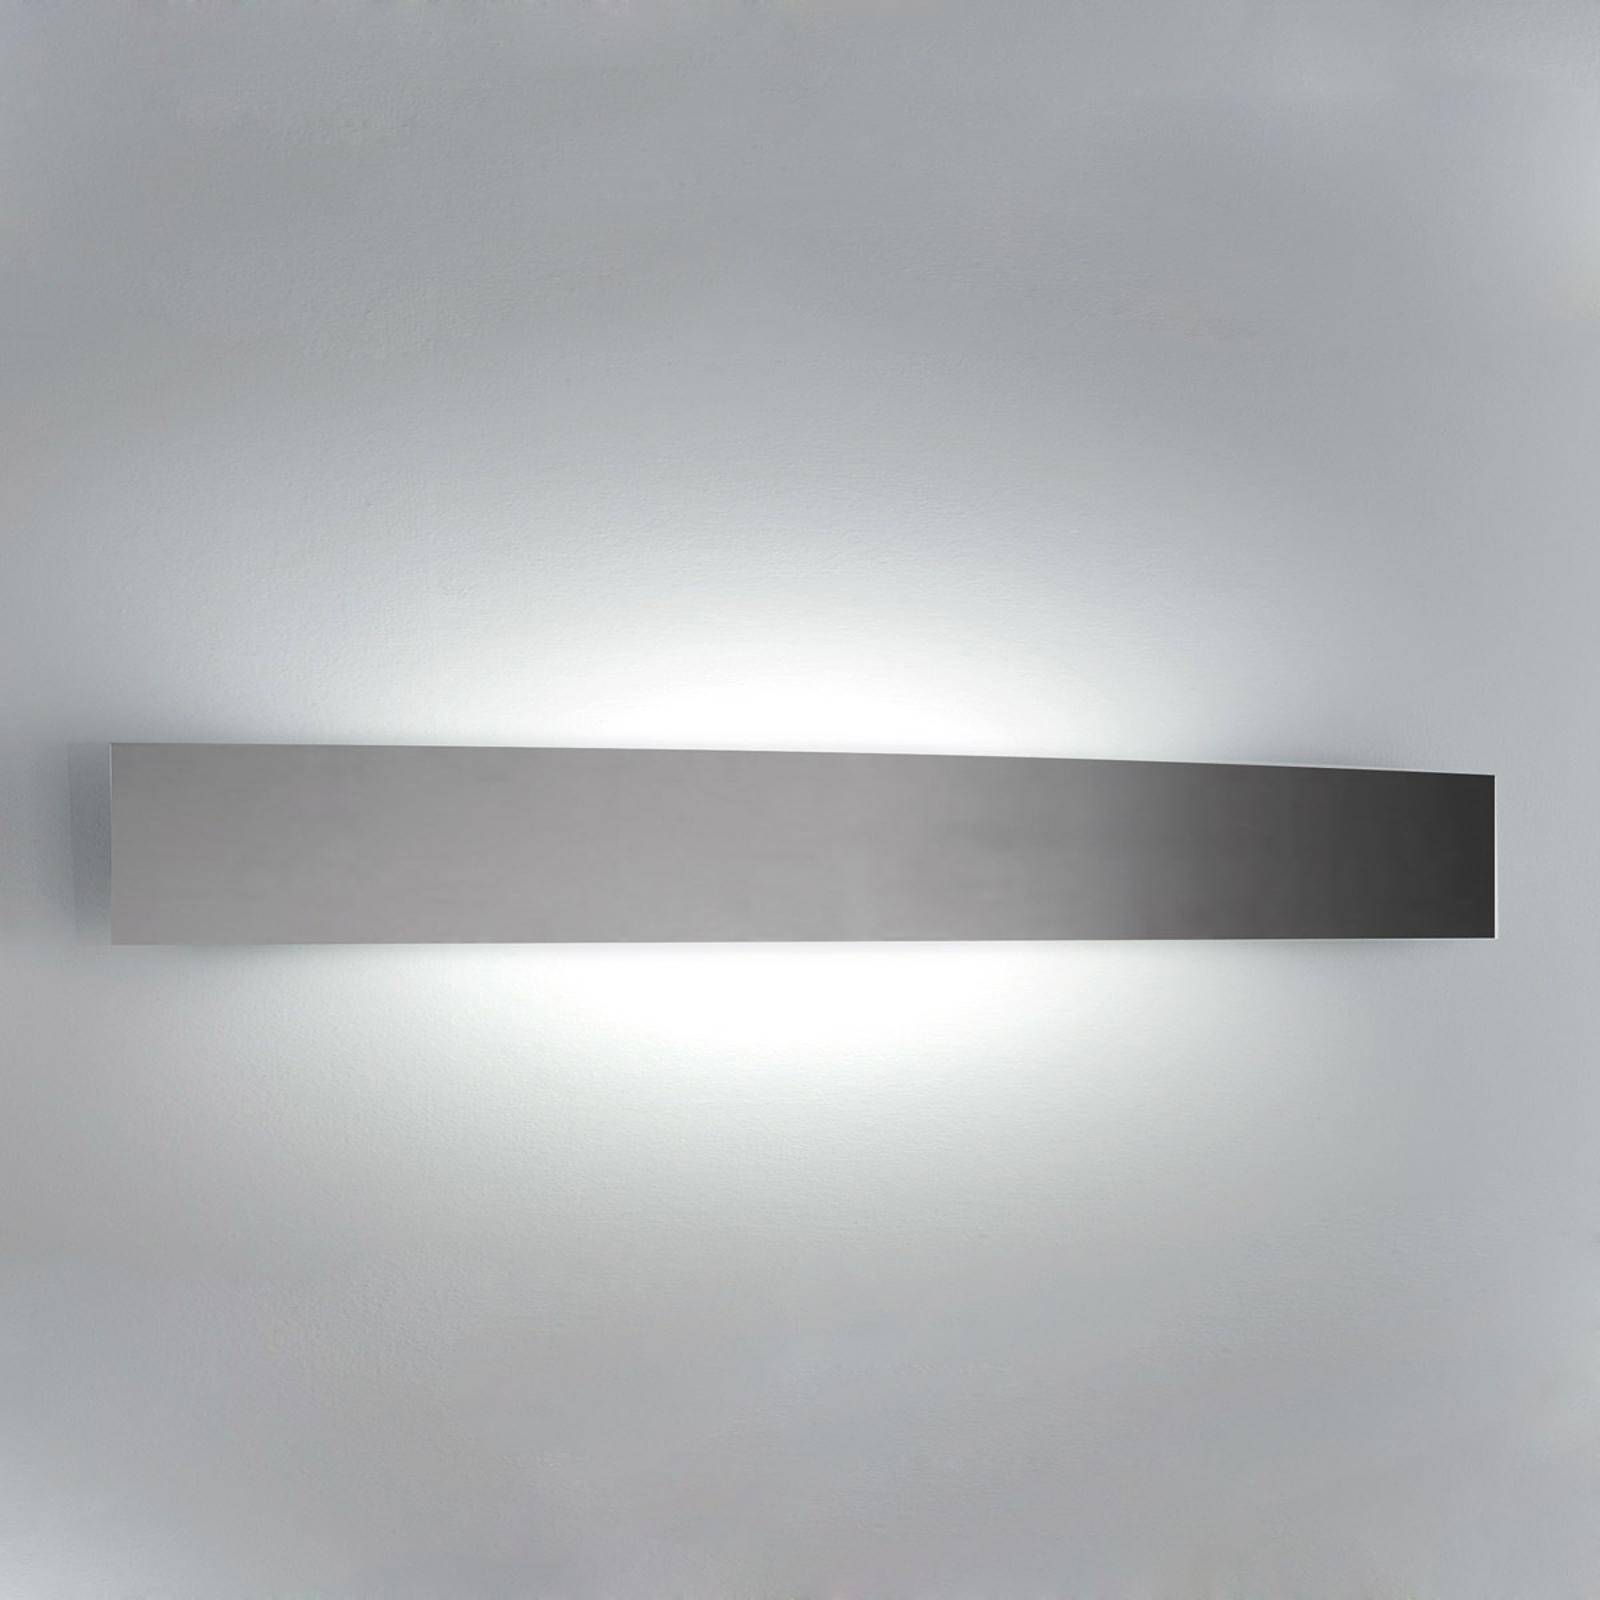 Mooie wandlamp RIGA, 56 cm, nikkel